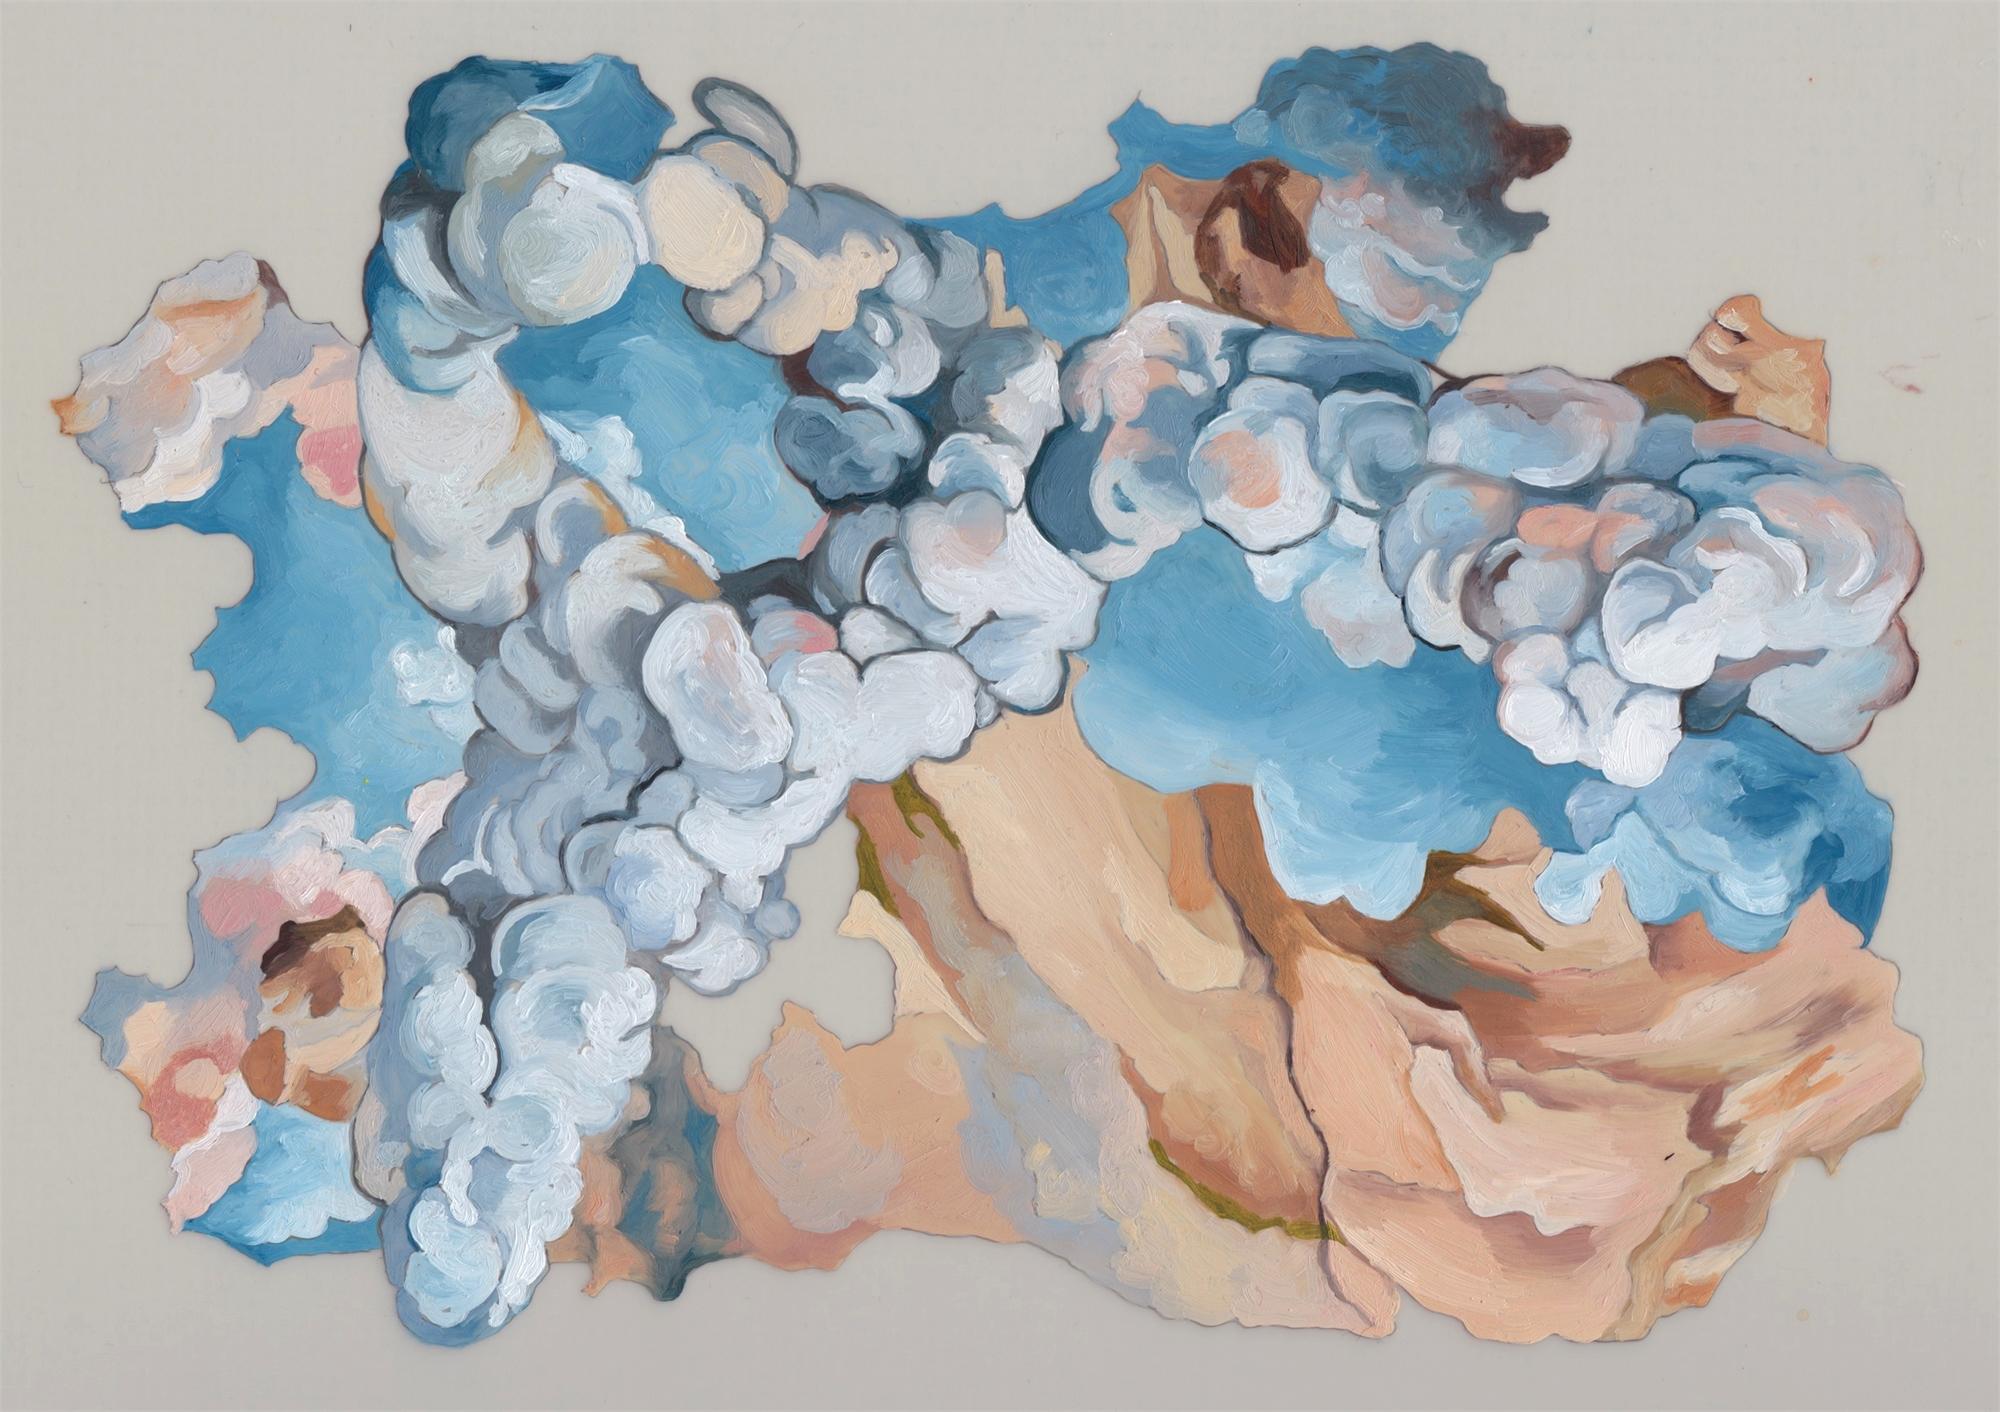 Skies by Melissa Furness